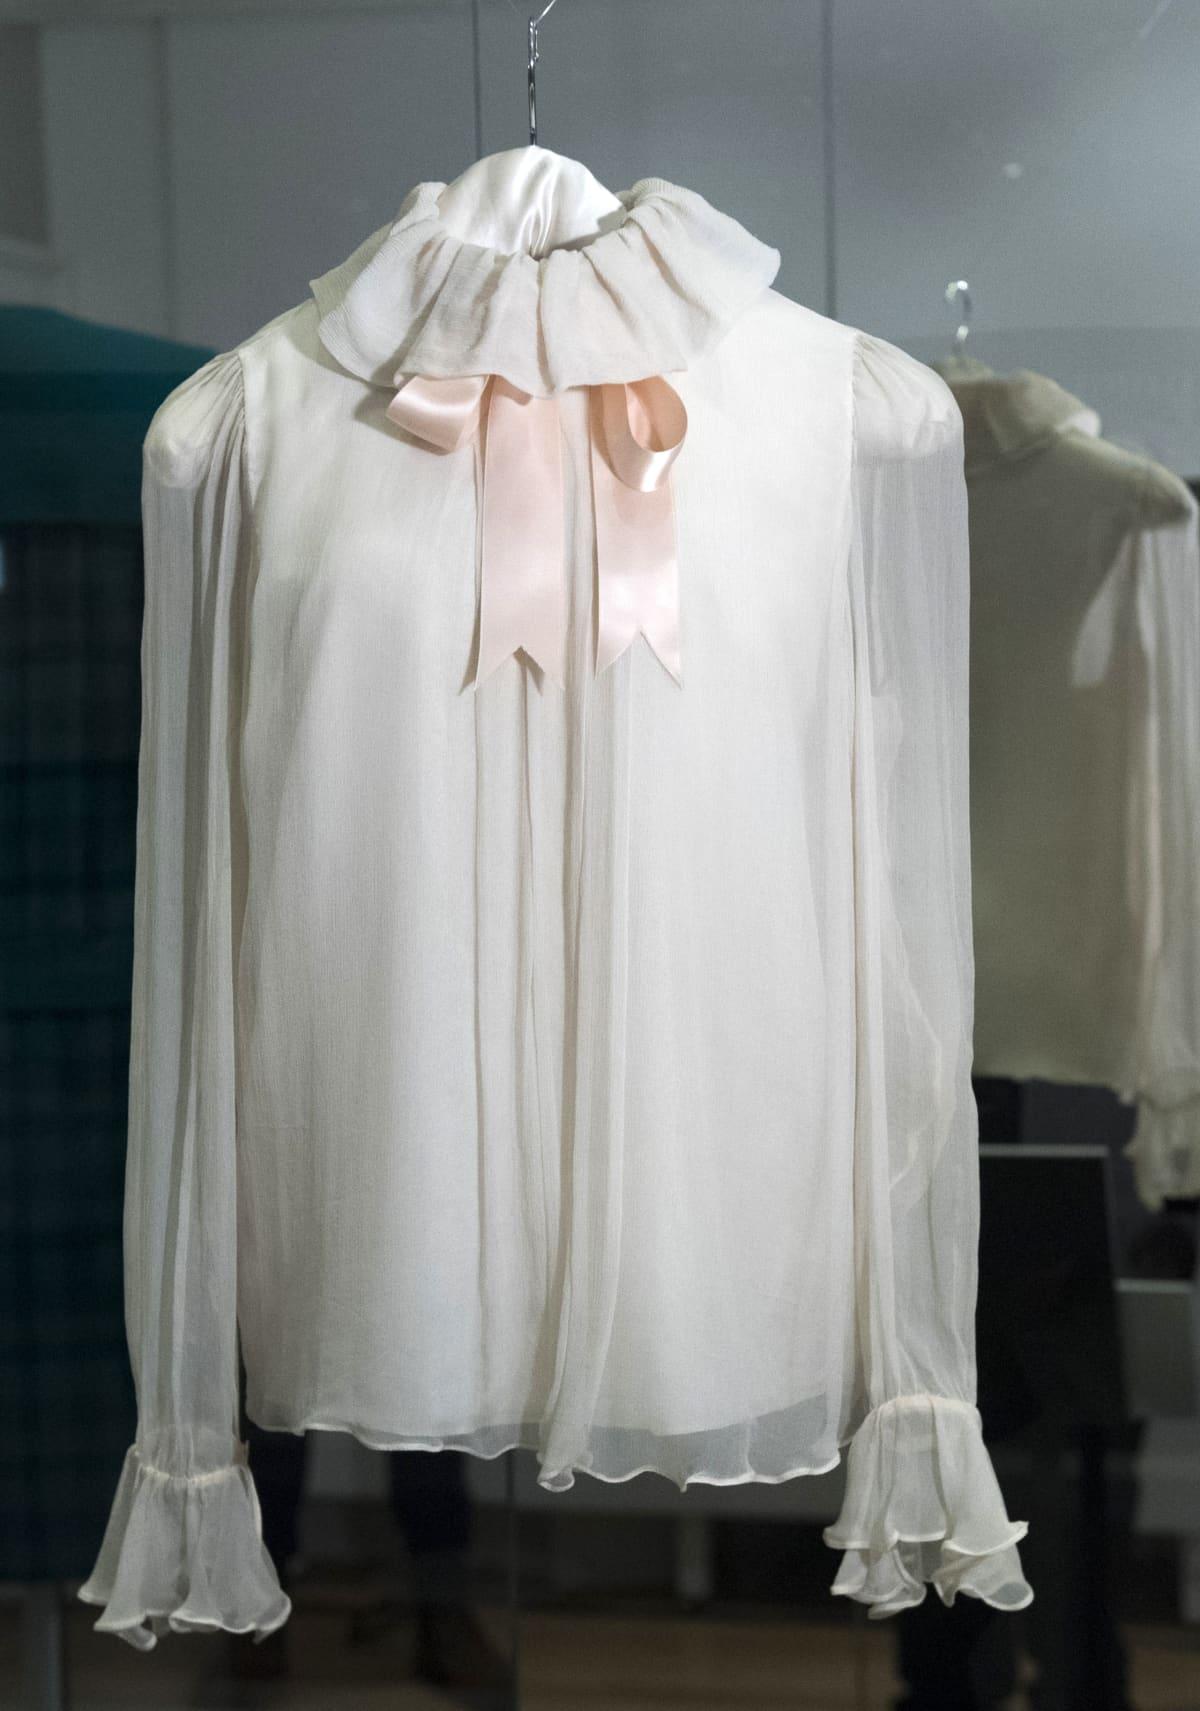 Dianan paita